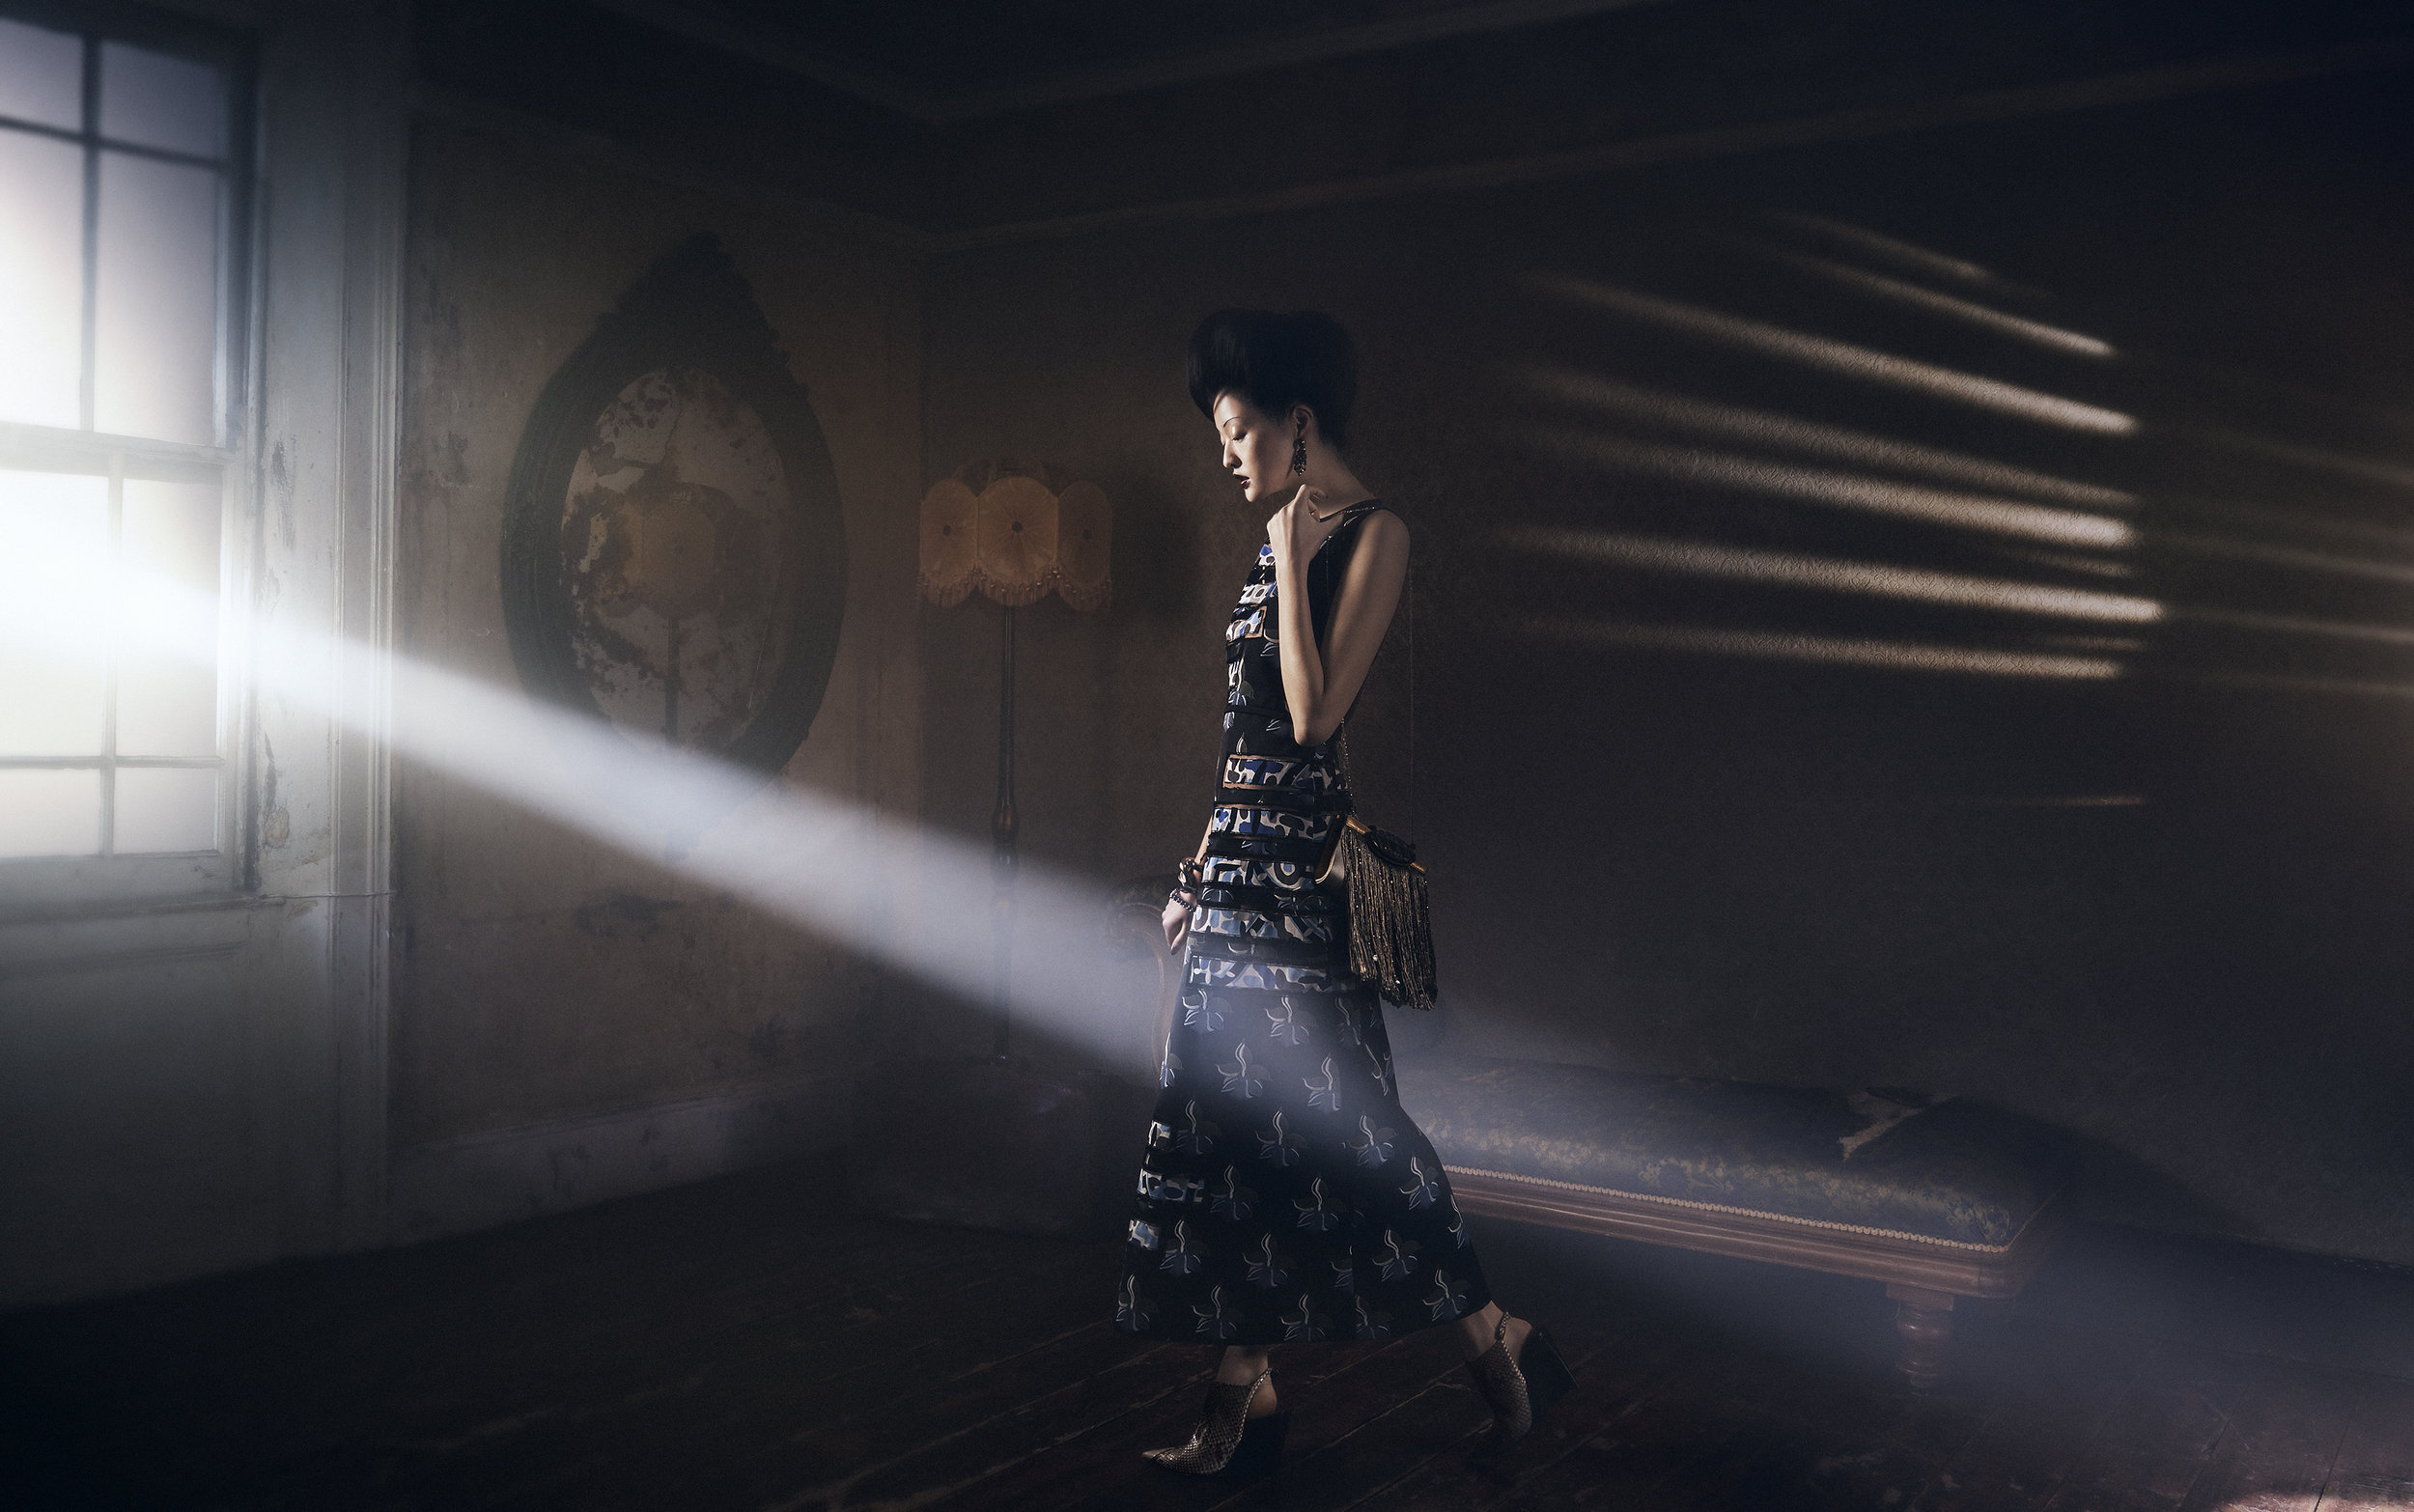 Fendi / Giorgio Armani / George McLeod / Luxure Magazine